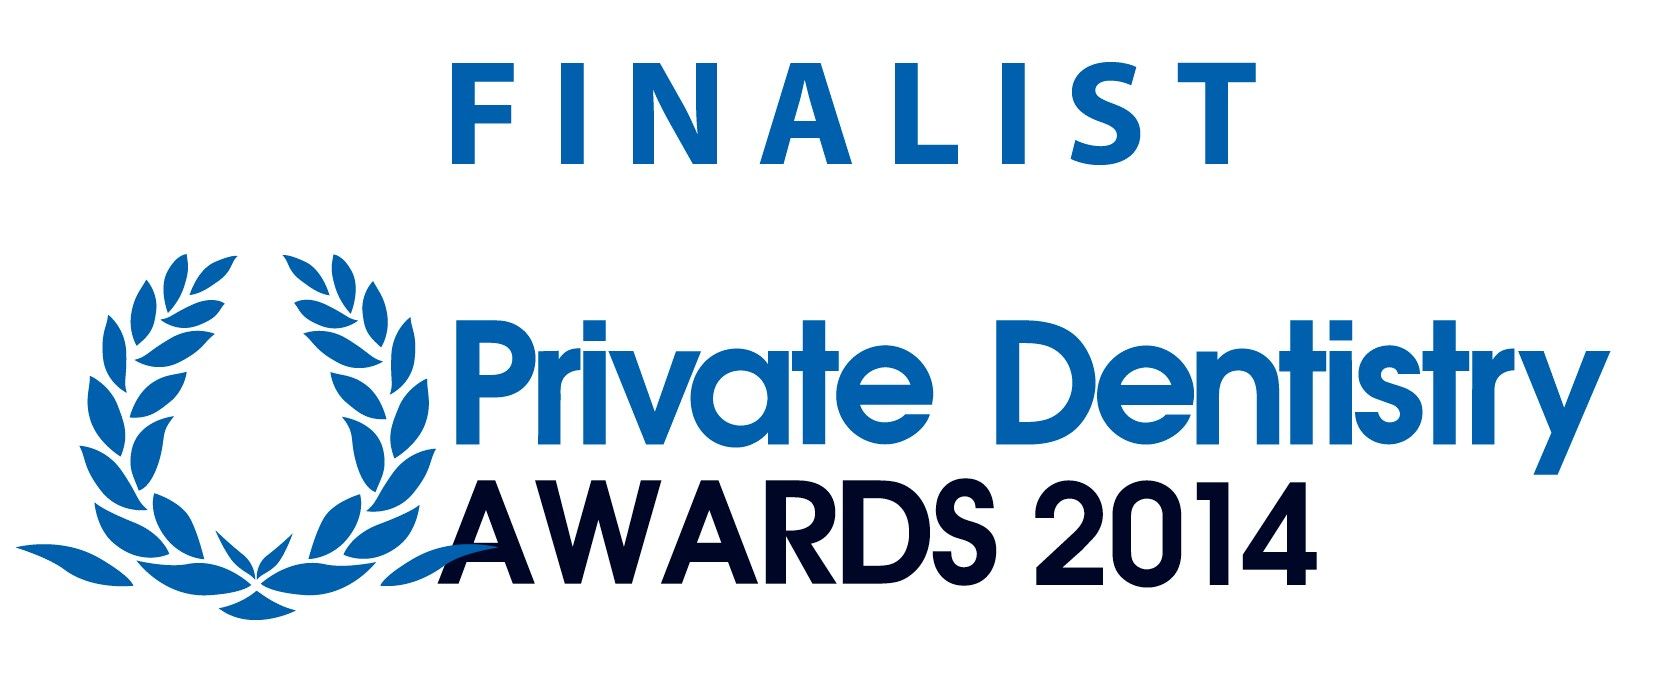 Private dentistry awards 2014